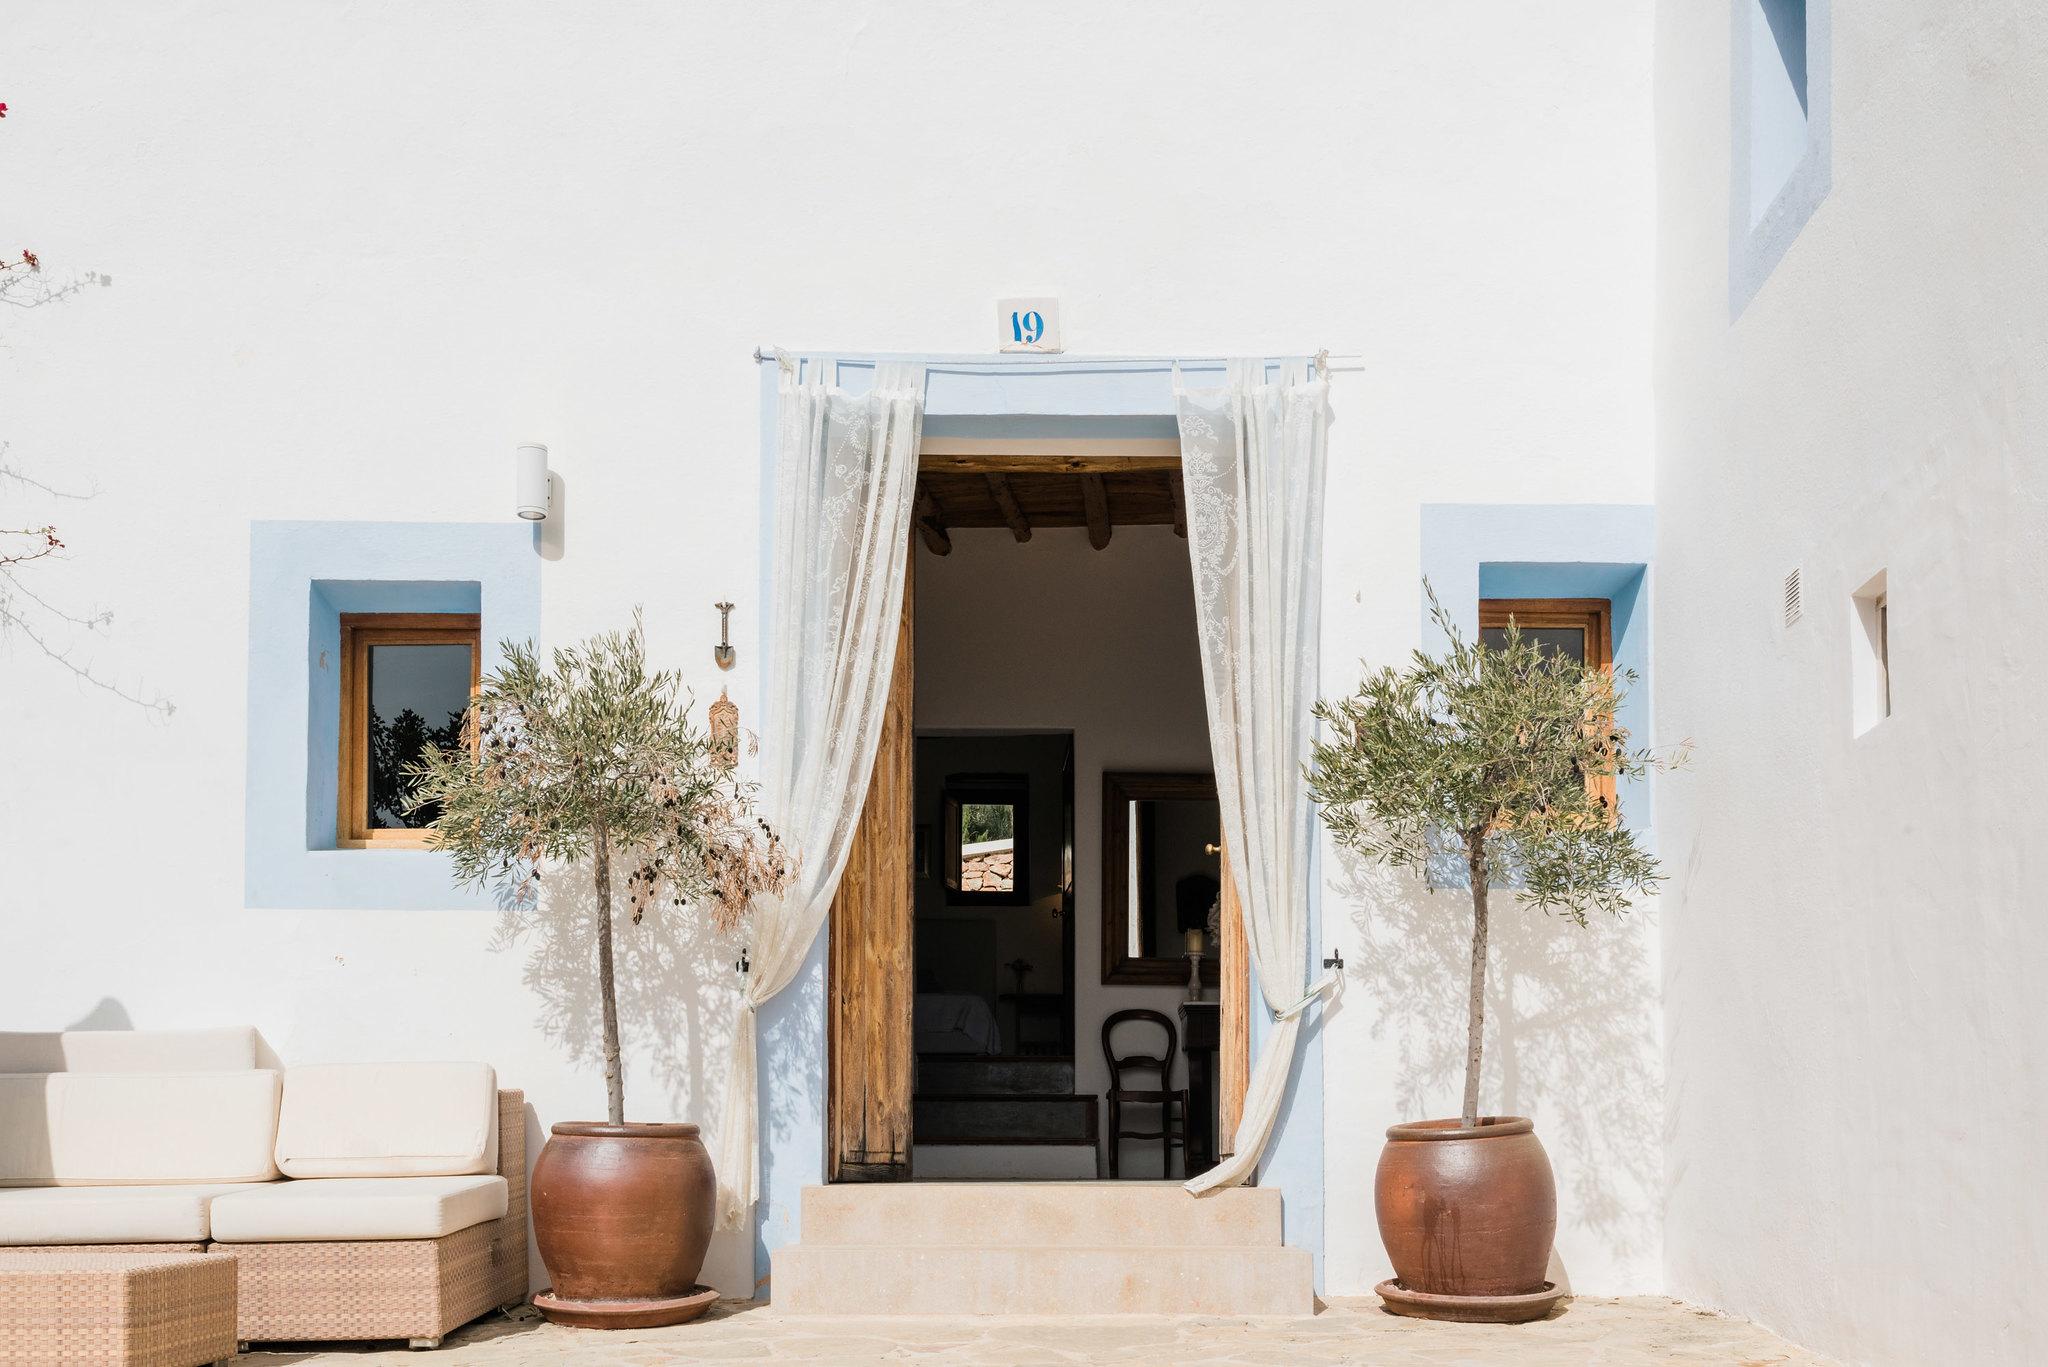 https://www.white-ibiza.com/wp-content/uploads/2020/06/white-ibiza-villas-los-corrales-exterior-entrance.jpg